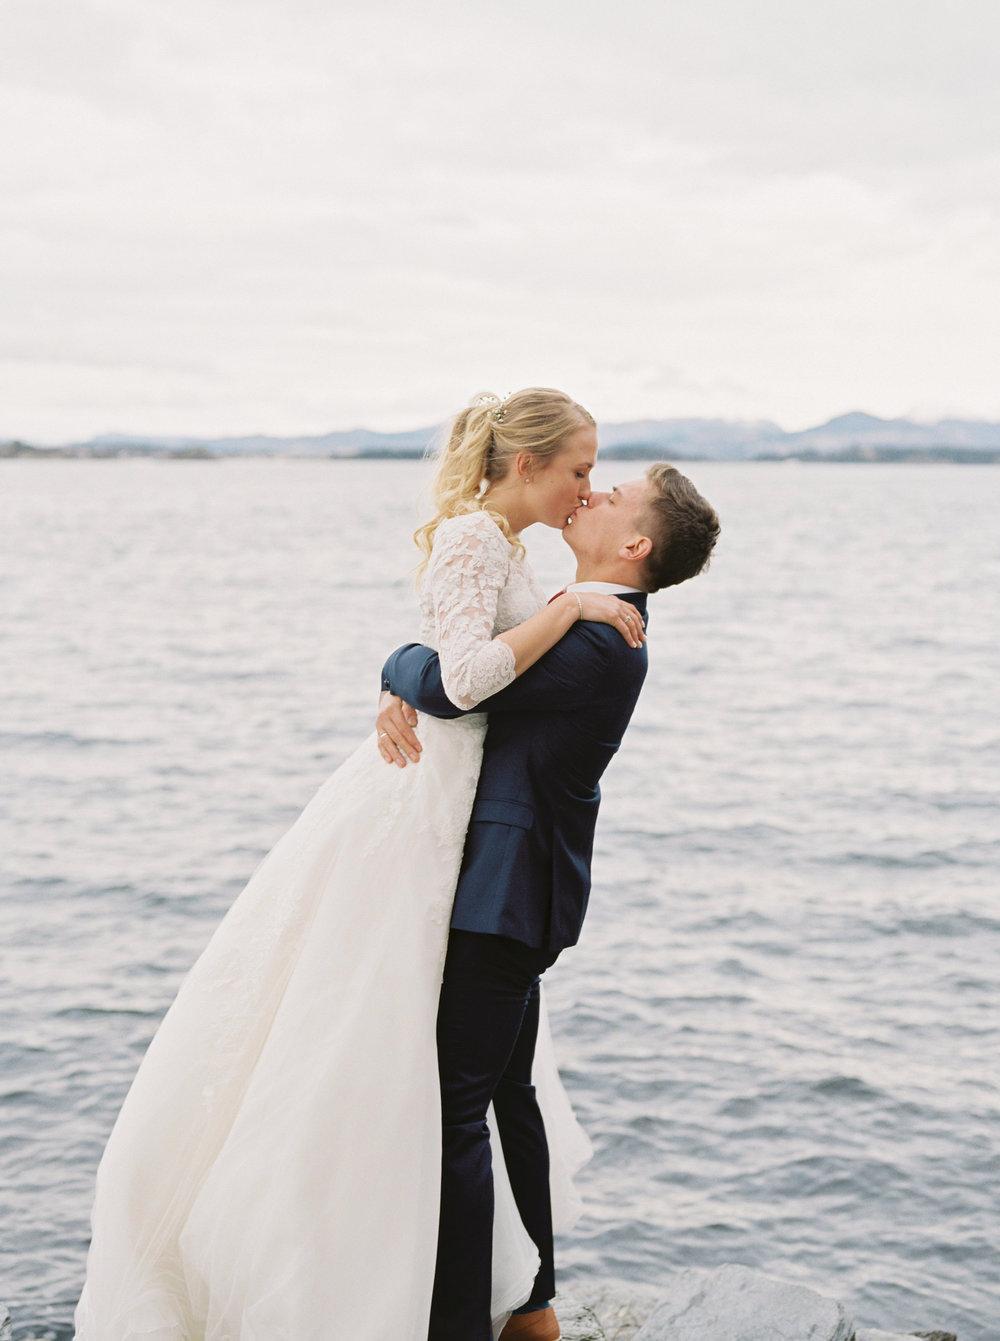 BEN & ADRIANE - STAVANGER, NORWAY